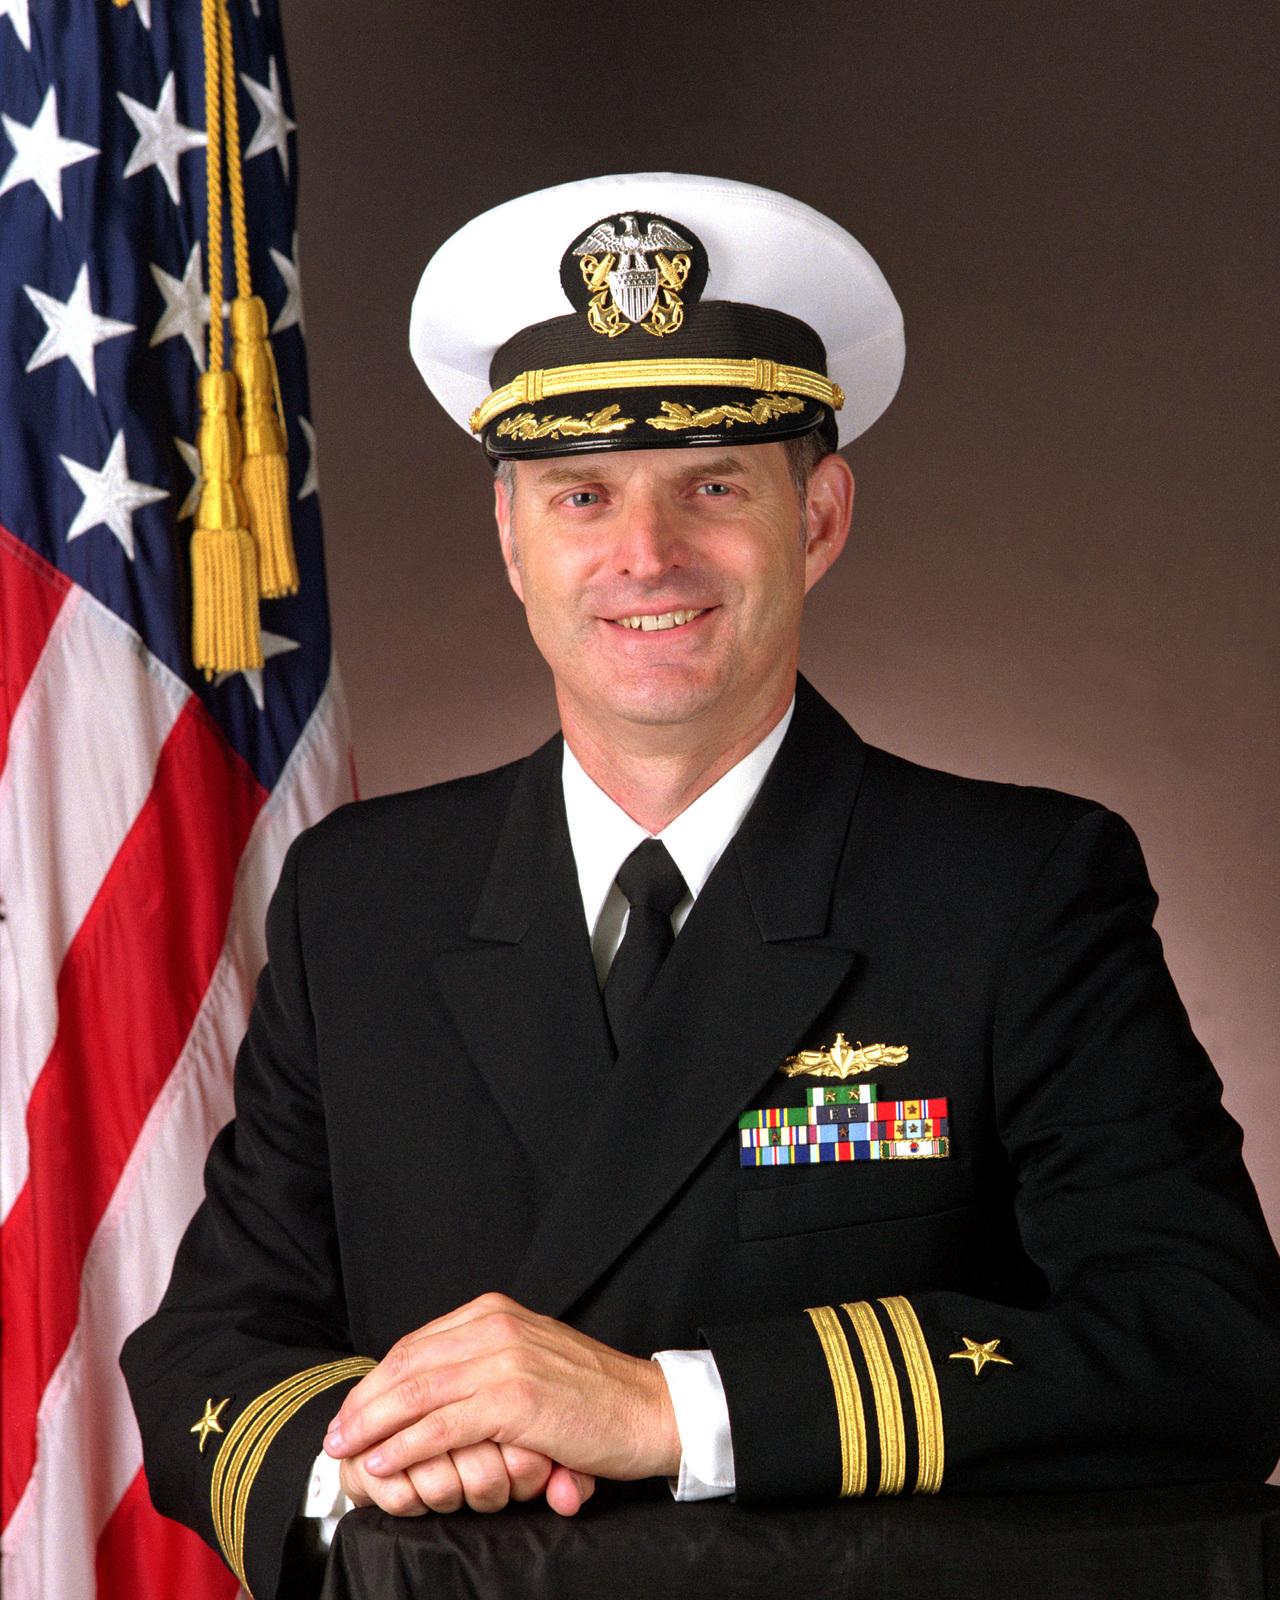 Commander James L. Warren, USN